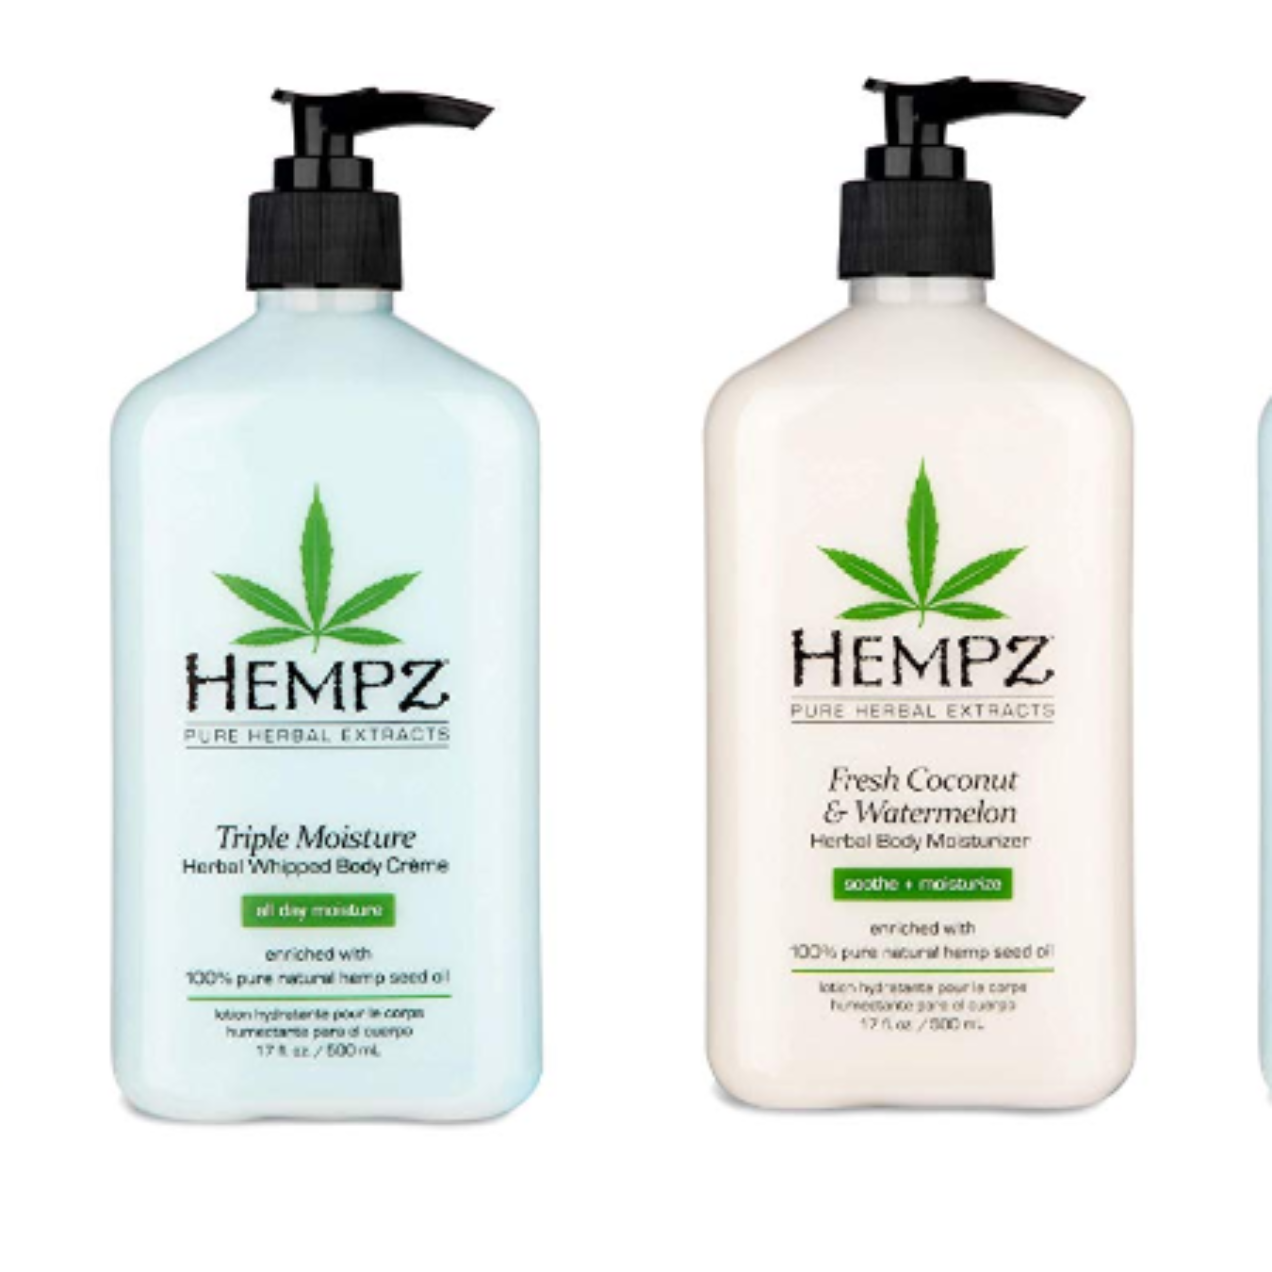 Hempz Natural Herbal Body Moisturizer & Body Wash Deal!